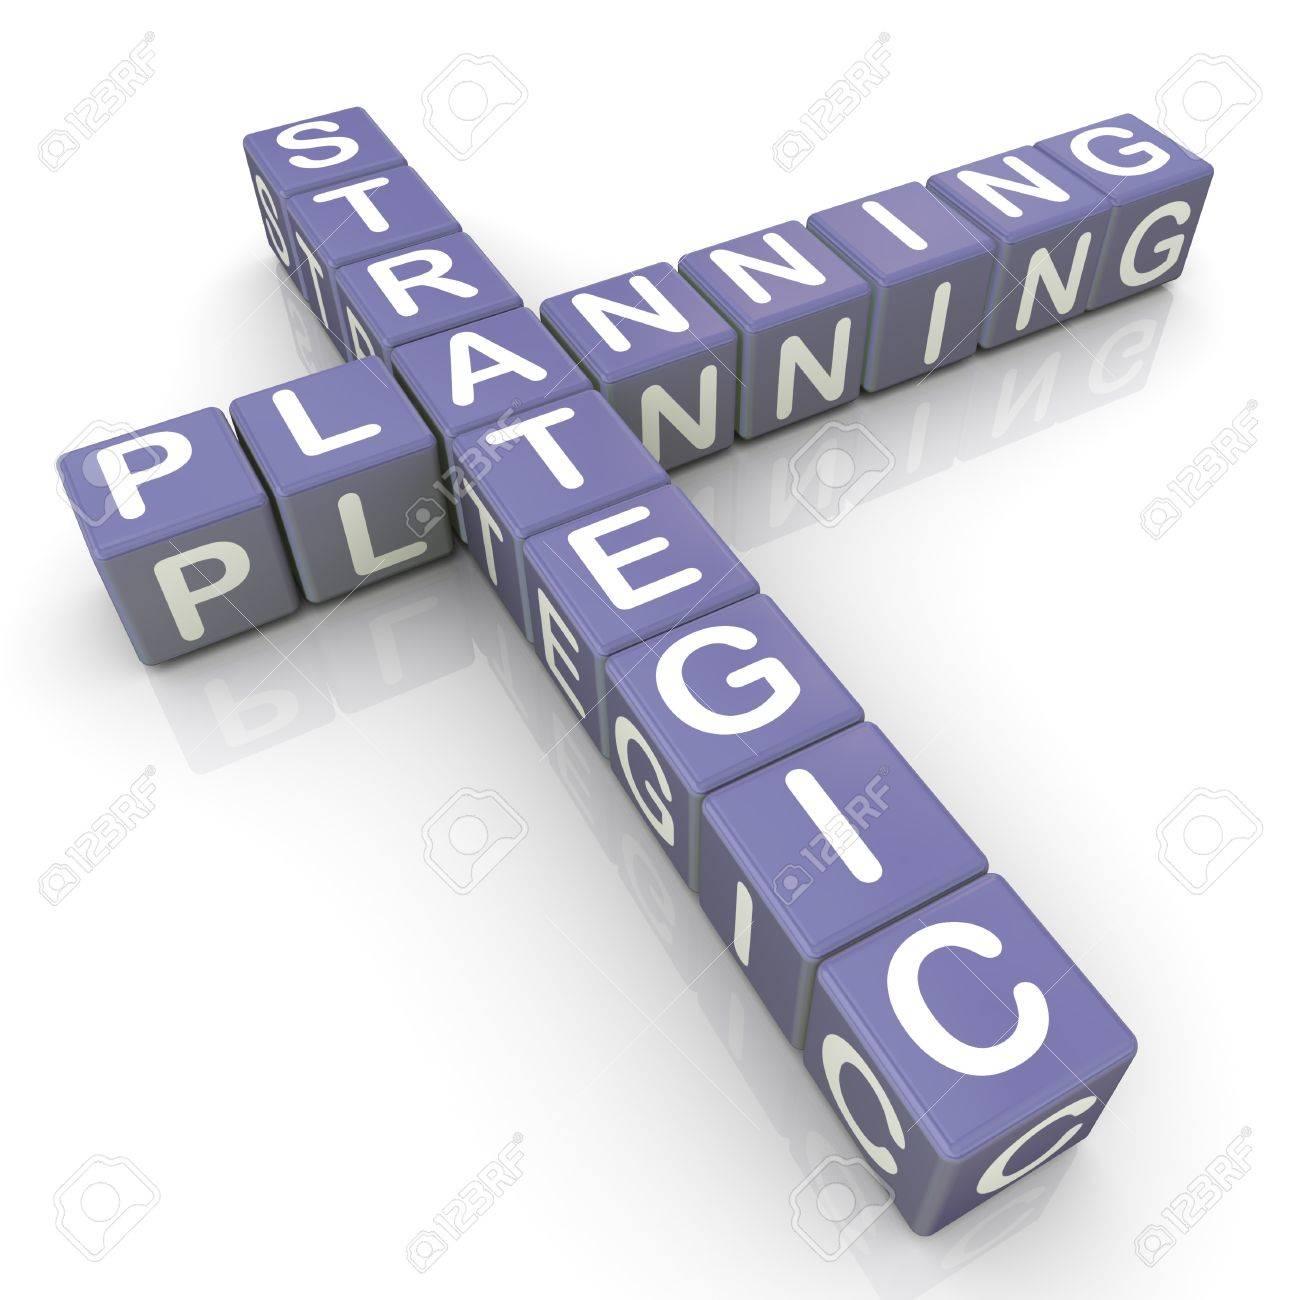 3d render of strategic planning crossword Stock Photo - 11404247